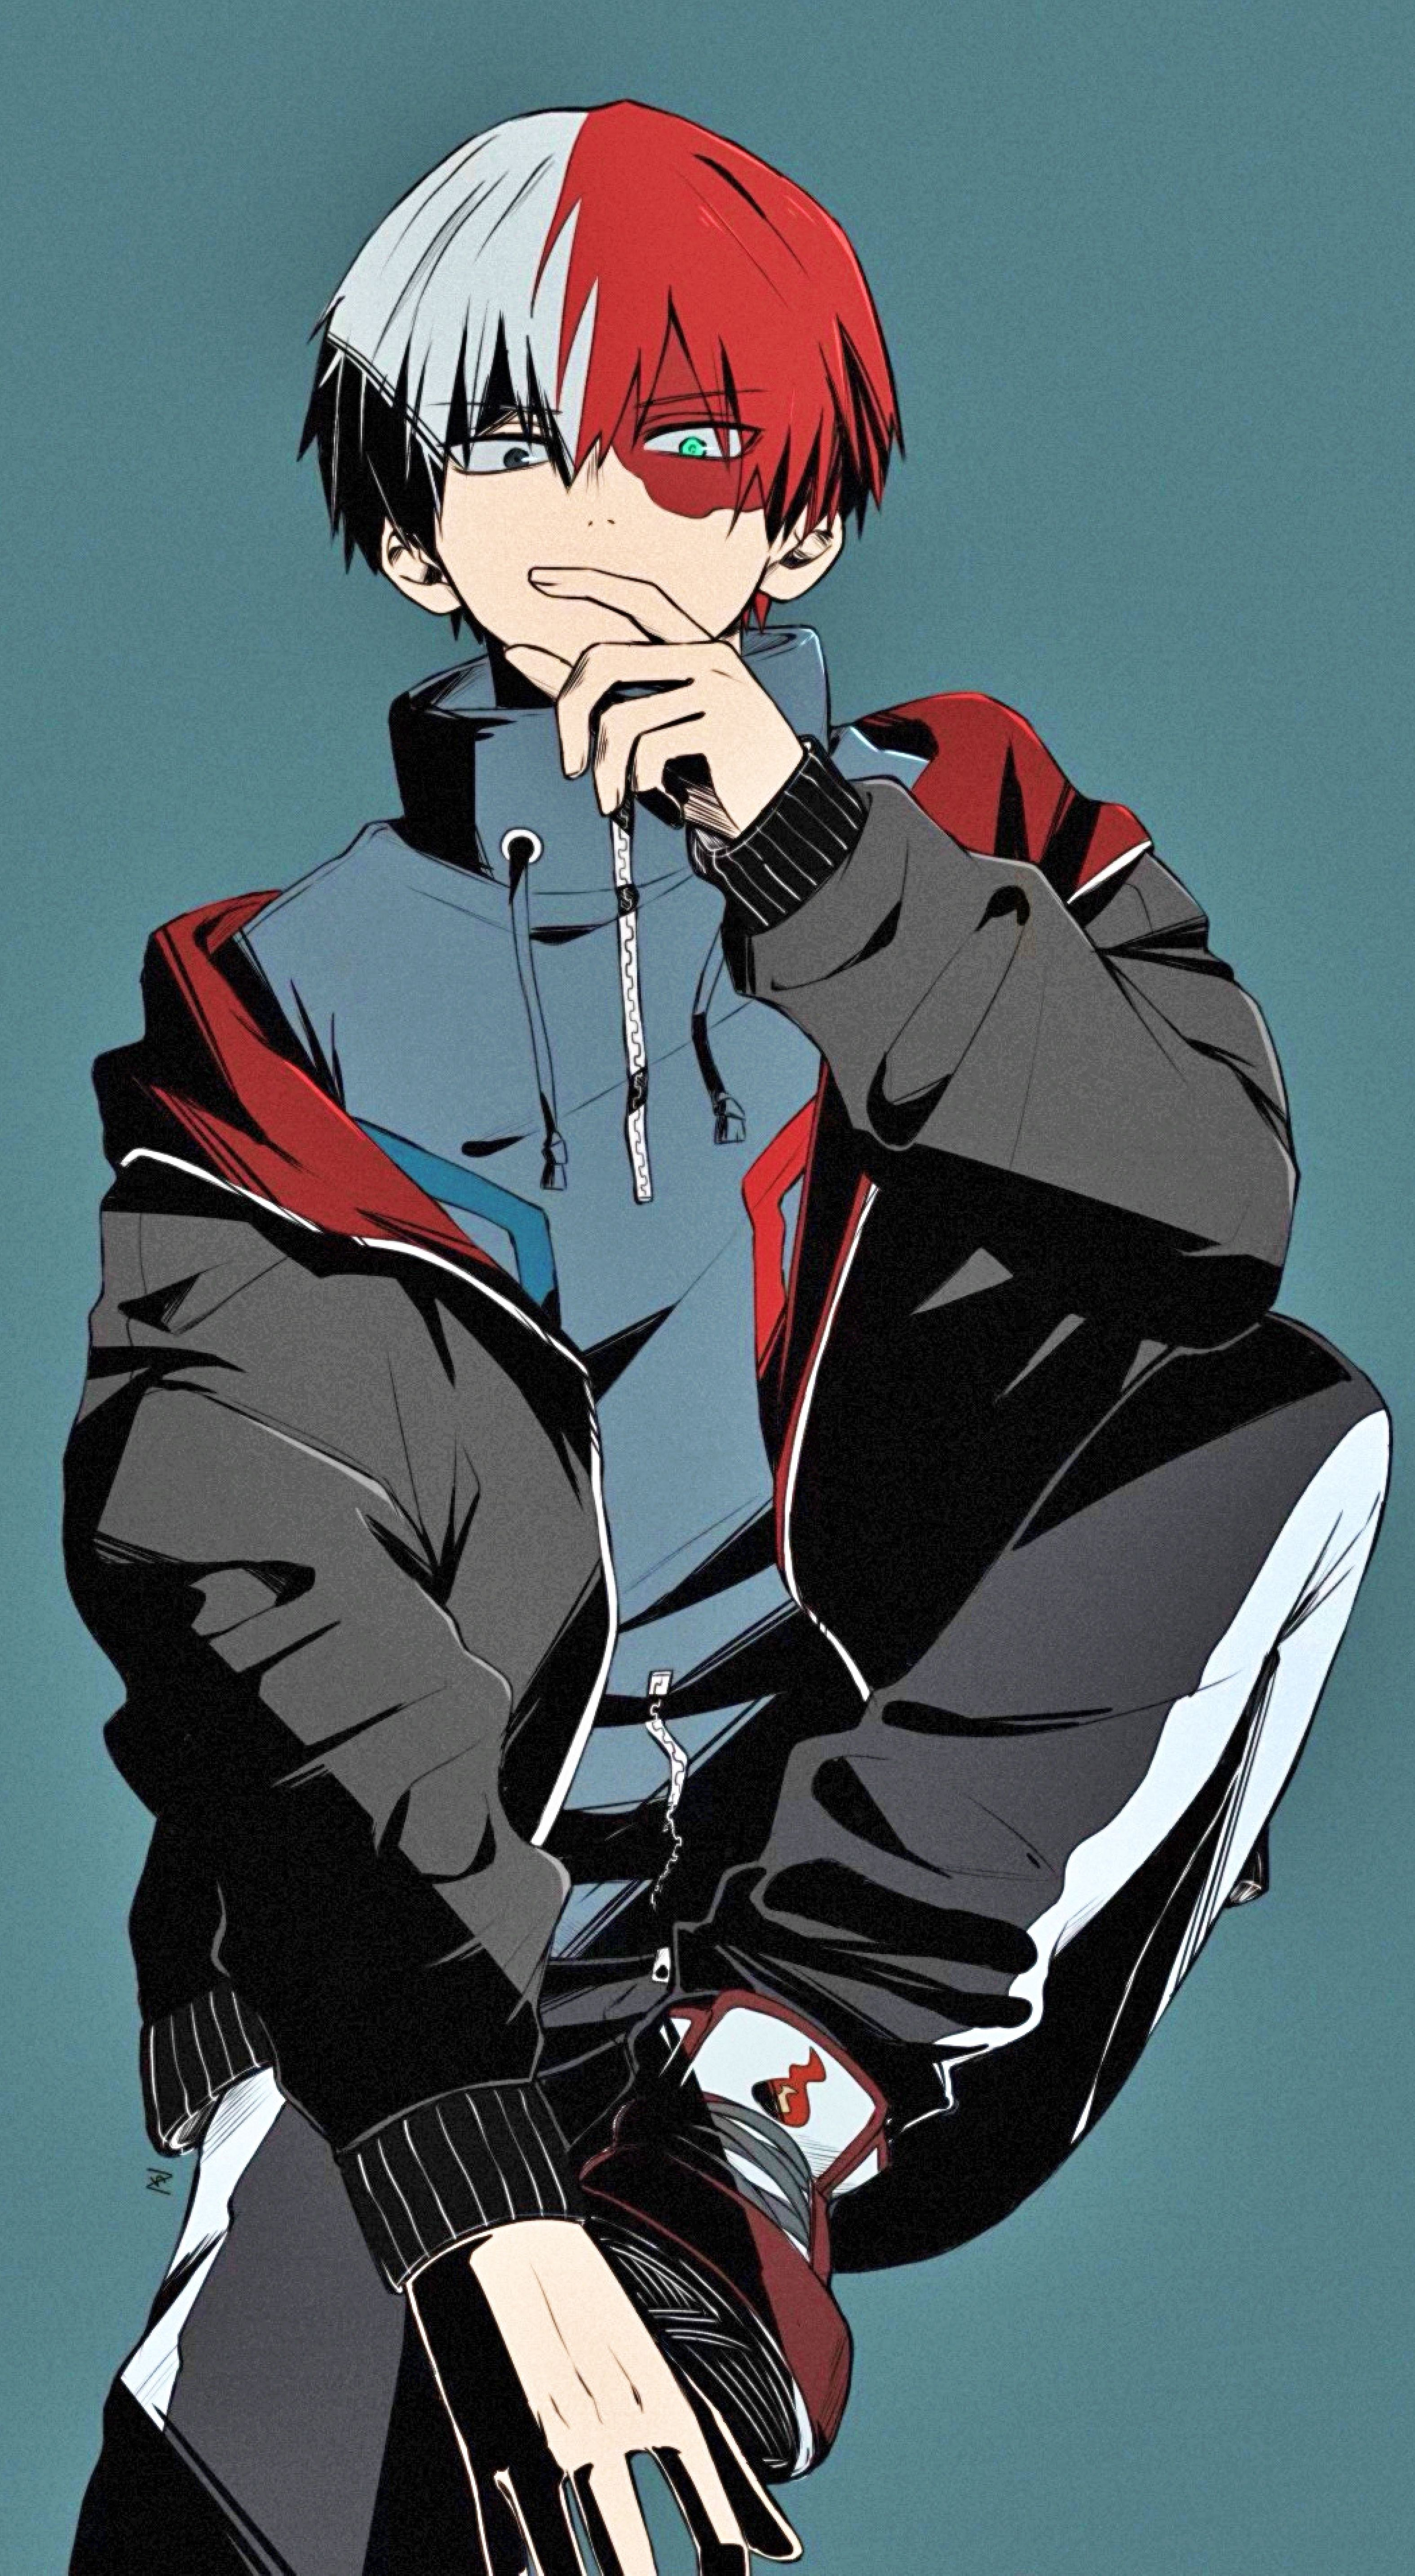 Photo of #anime wallpaper my hero academia BY ずん ╳ #GGHimSELF #GG ^^/